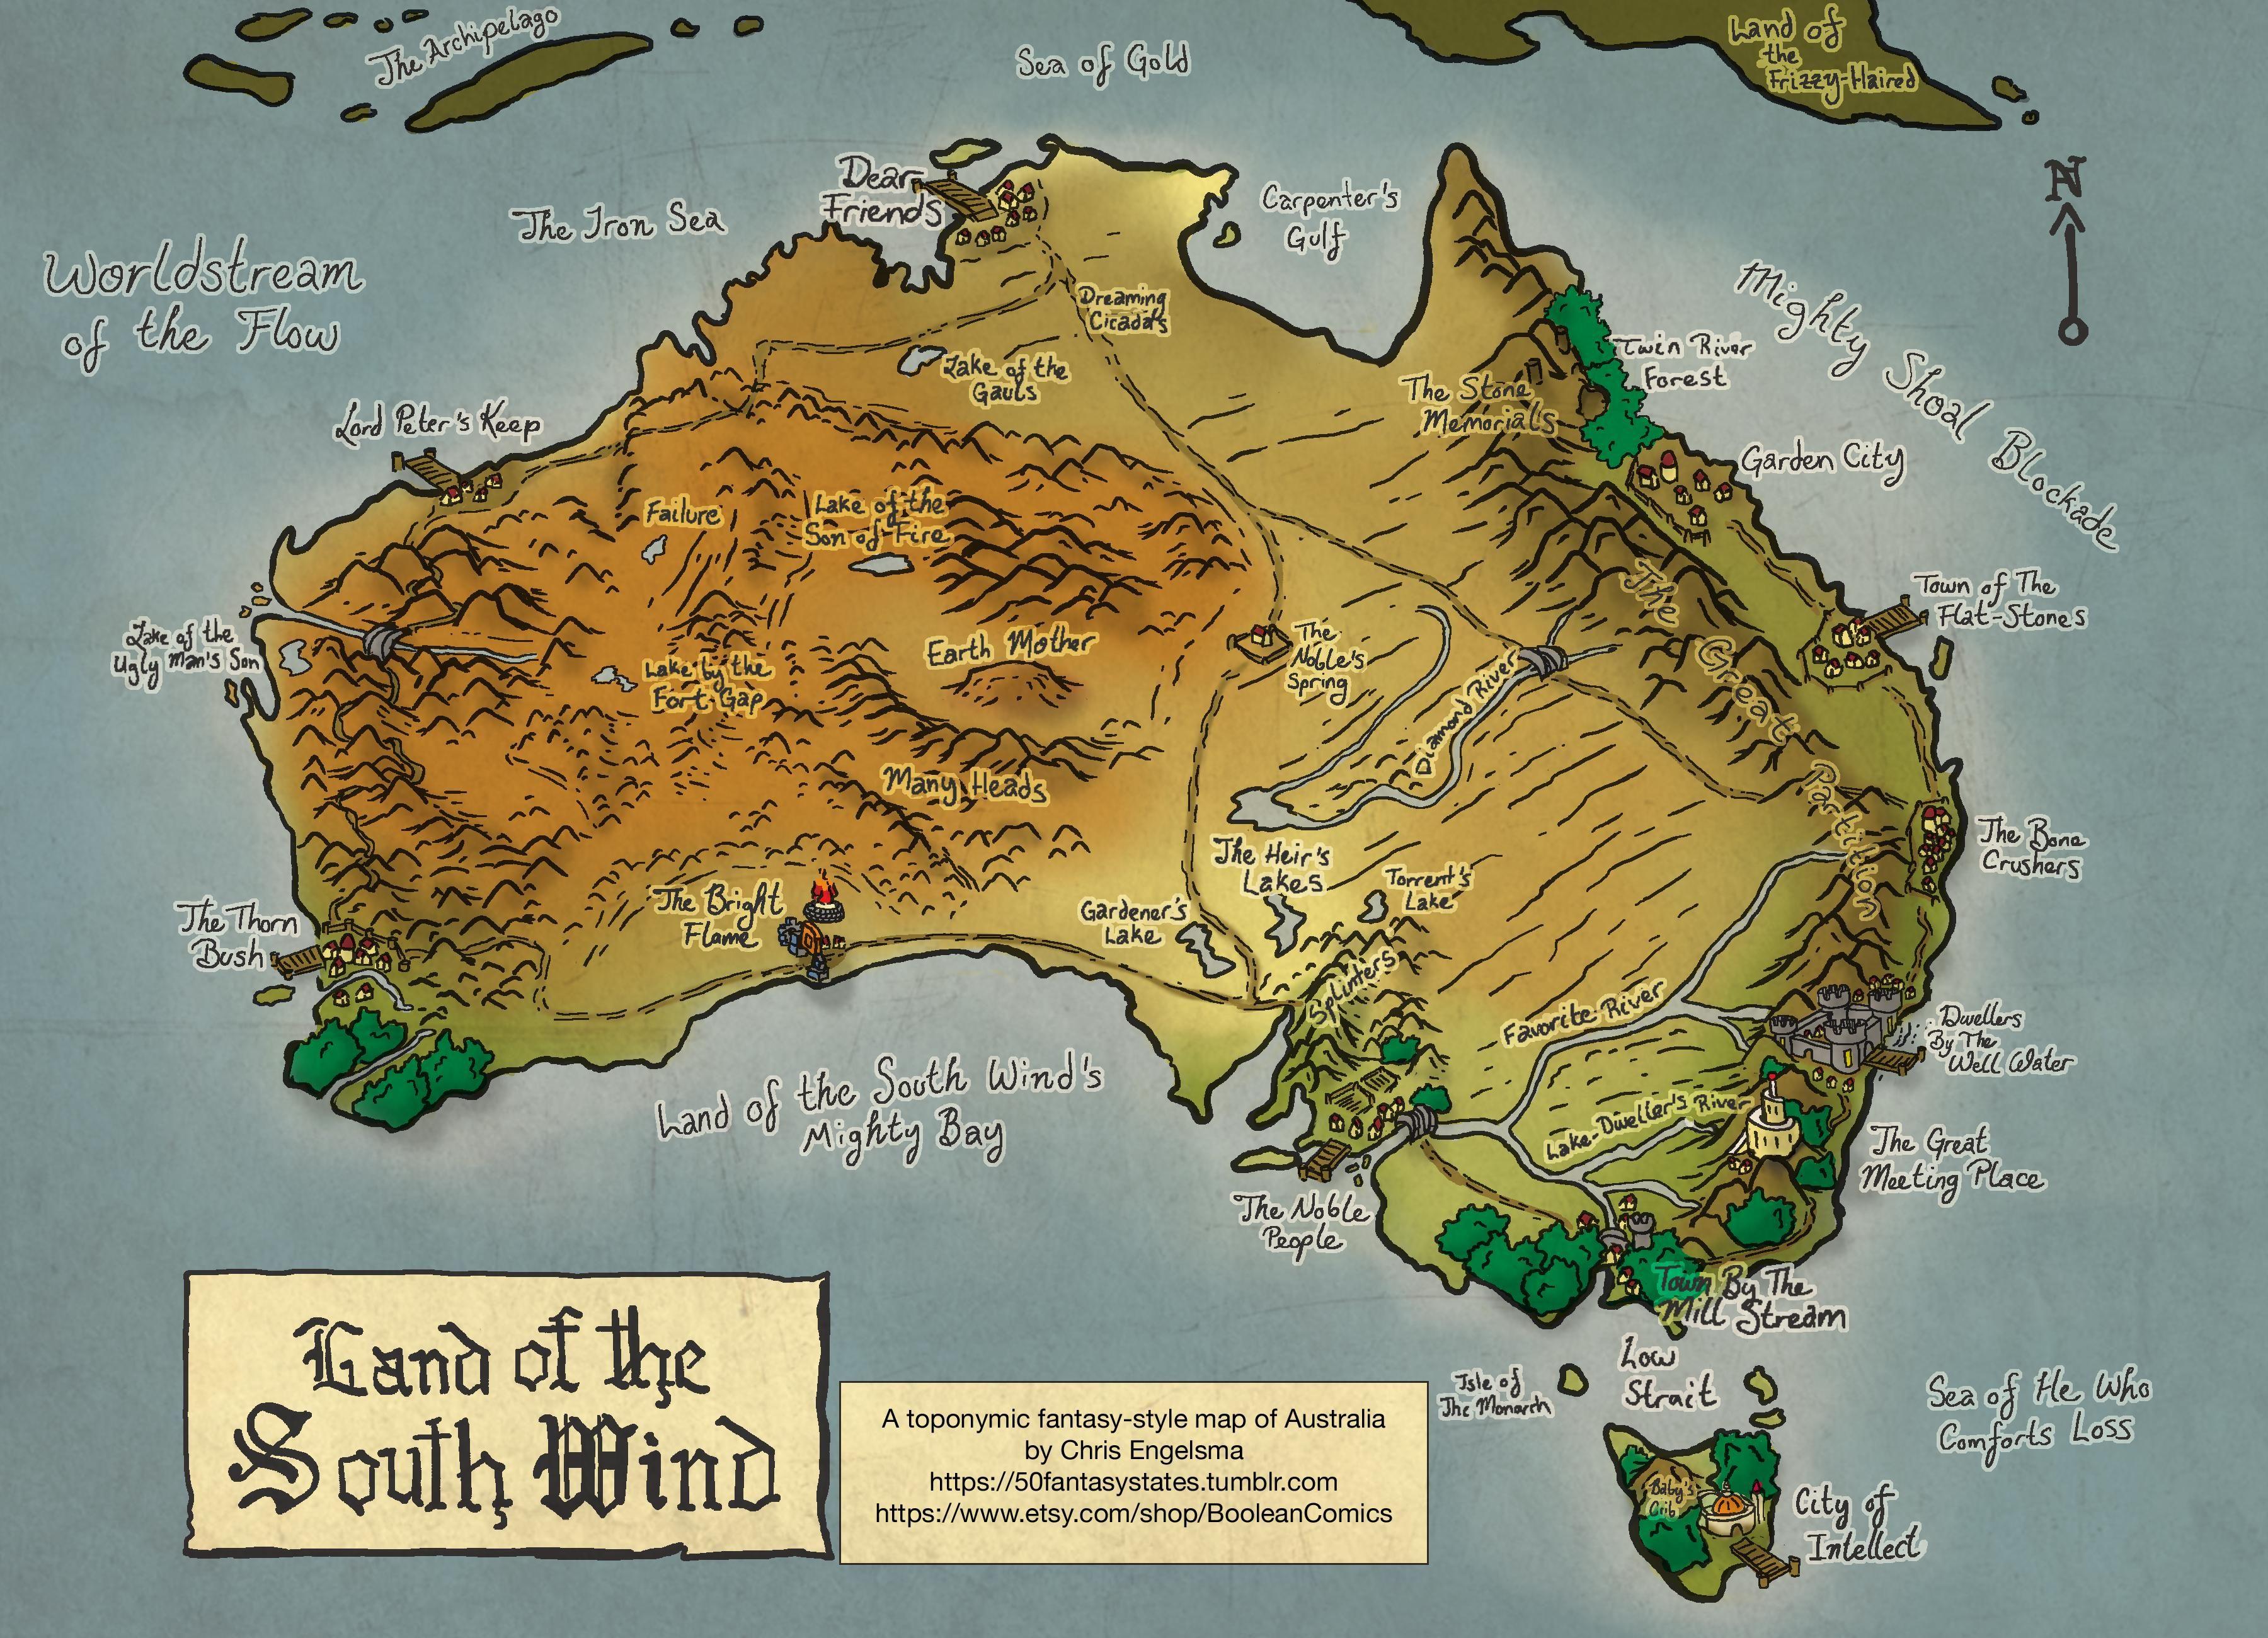 Map Of Australian Landscapes.Toponymic Fantasy Style Map Of Australia Fantasy Map In 2019